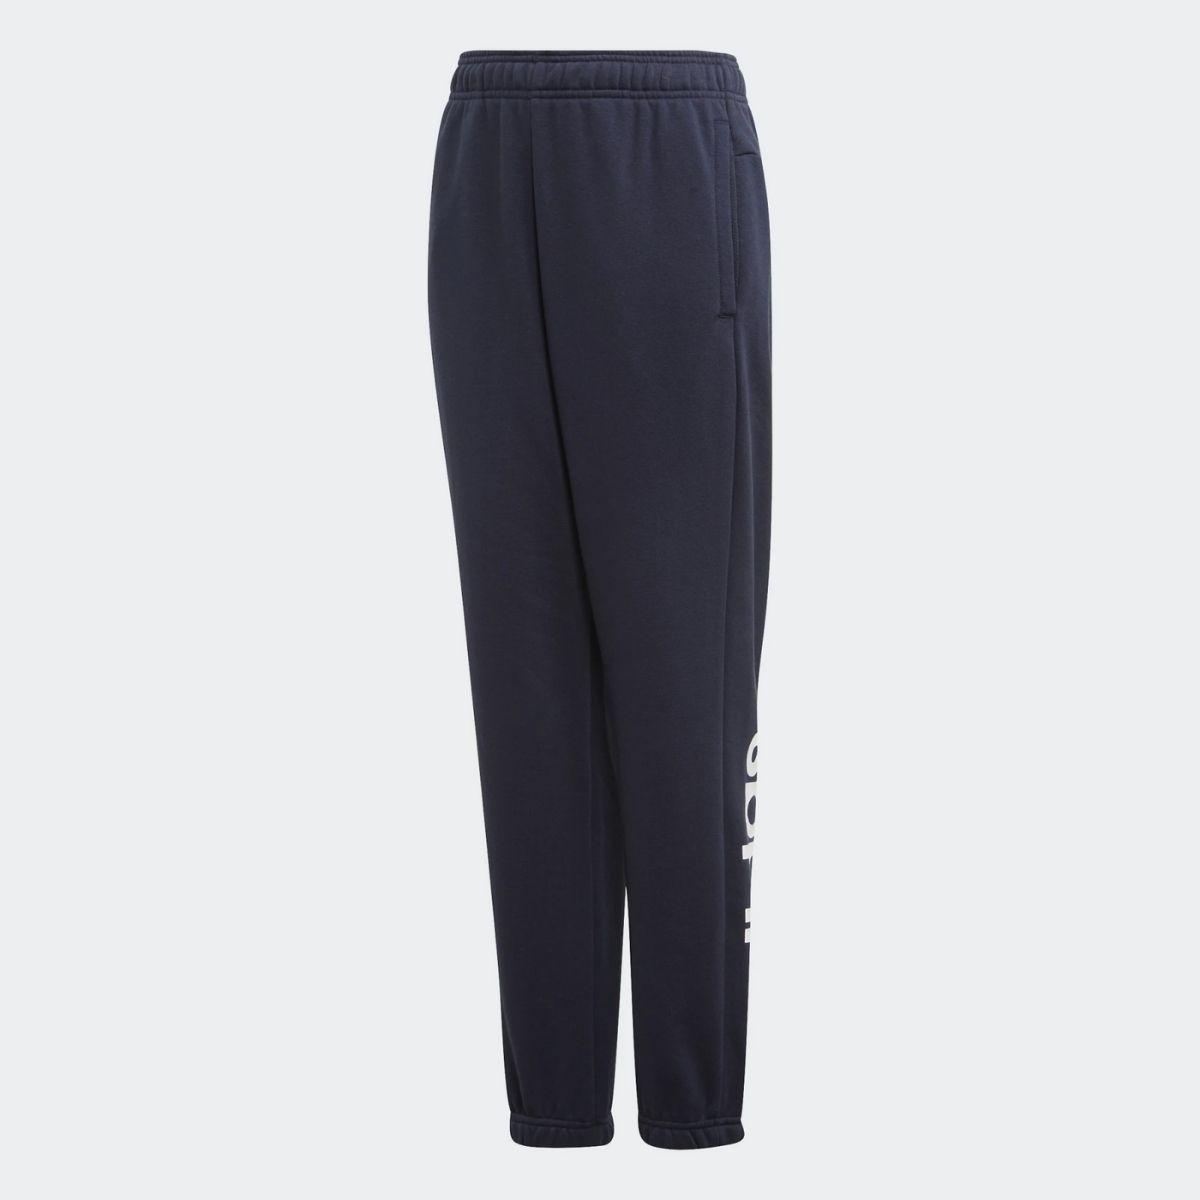 Pantalone Adidas Essentials...